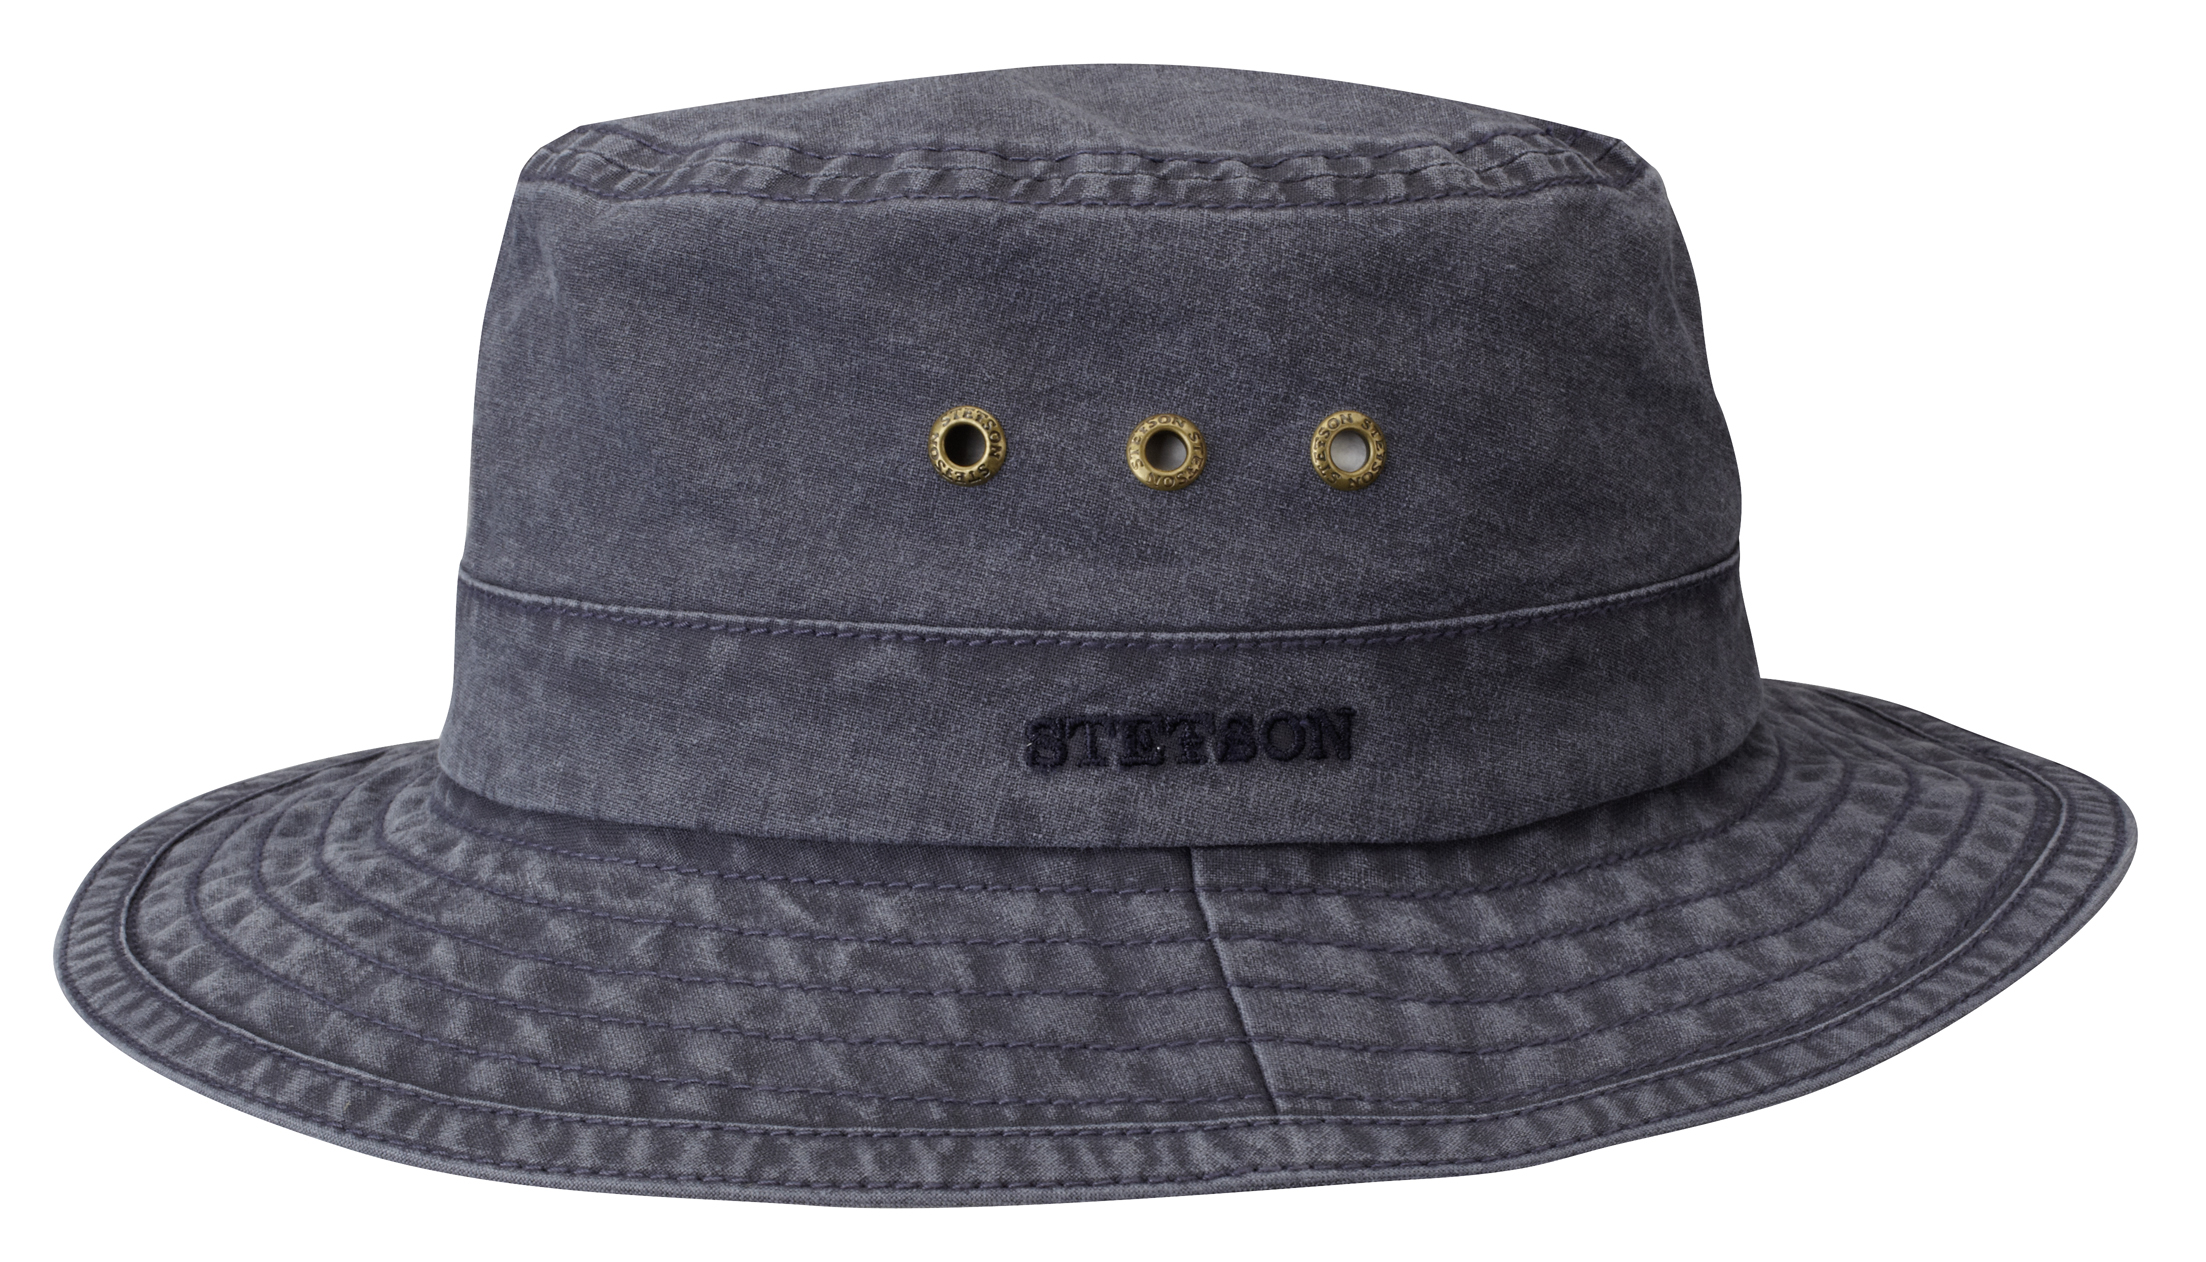 Stetson Trilby Ramie Vintage Lacivert Şapka